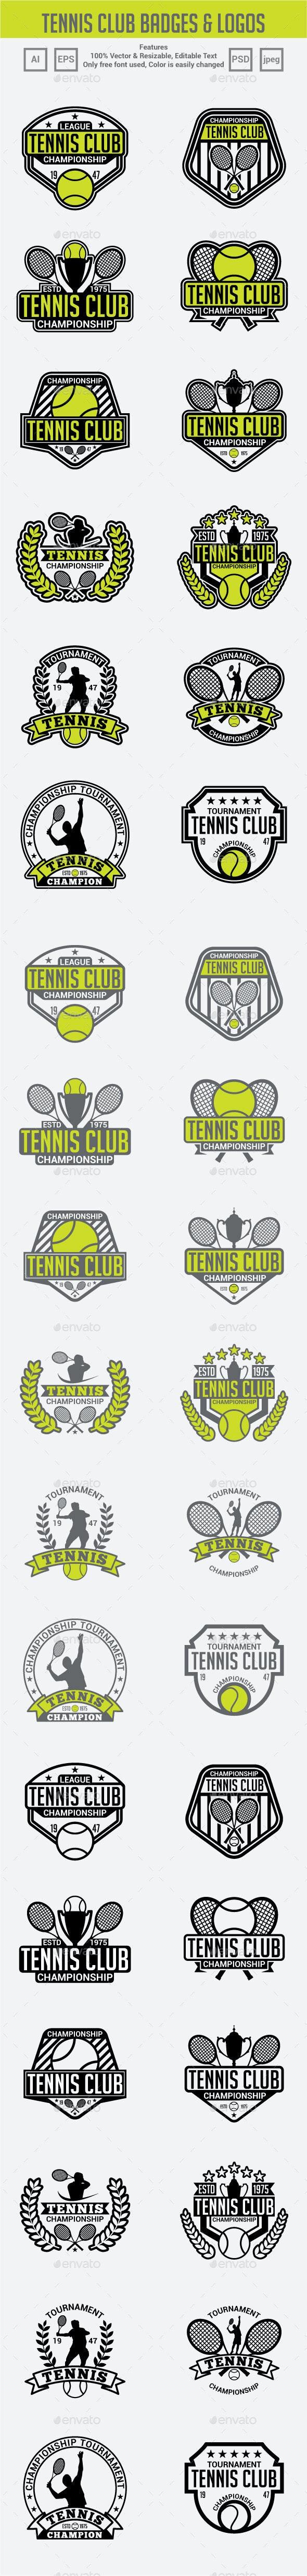 Tennis Club Badges & Logos - Badges & Stickers Web Elements